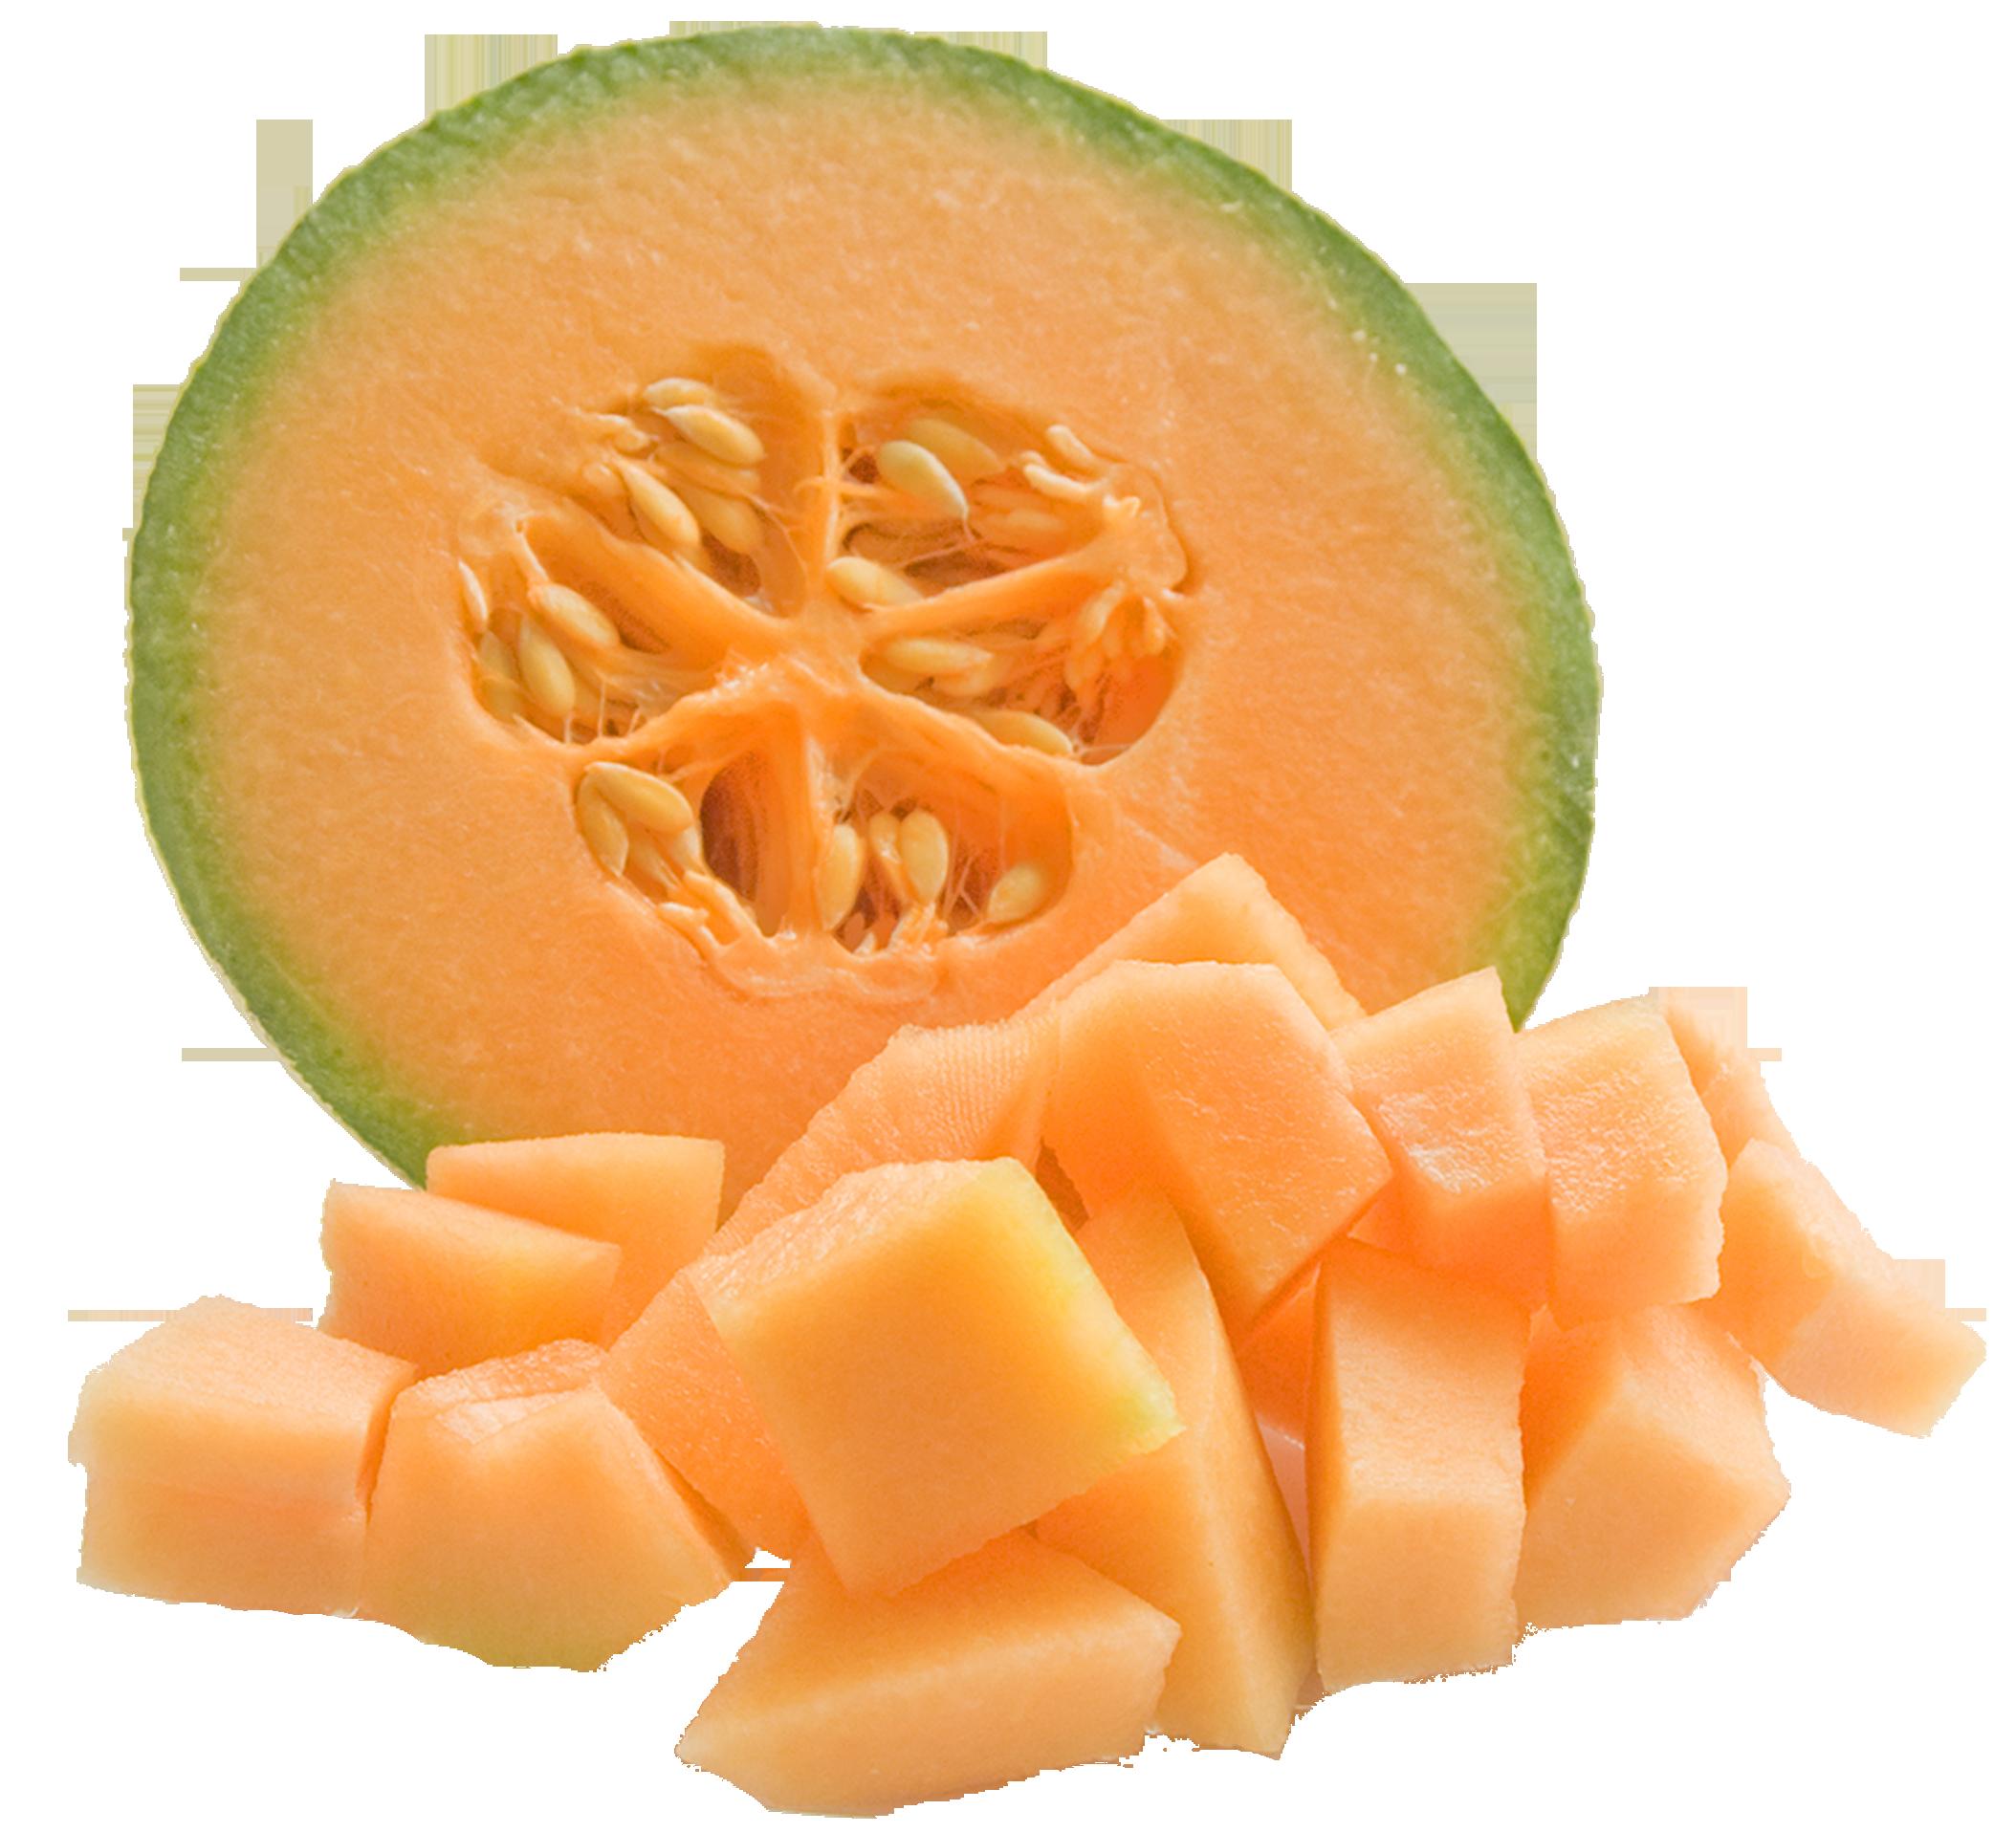 Watermelon clipart muskmelon.  collection of melon